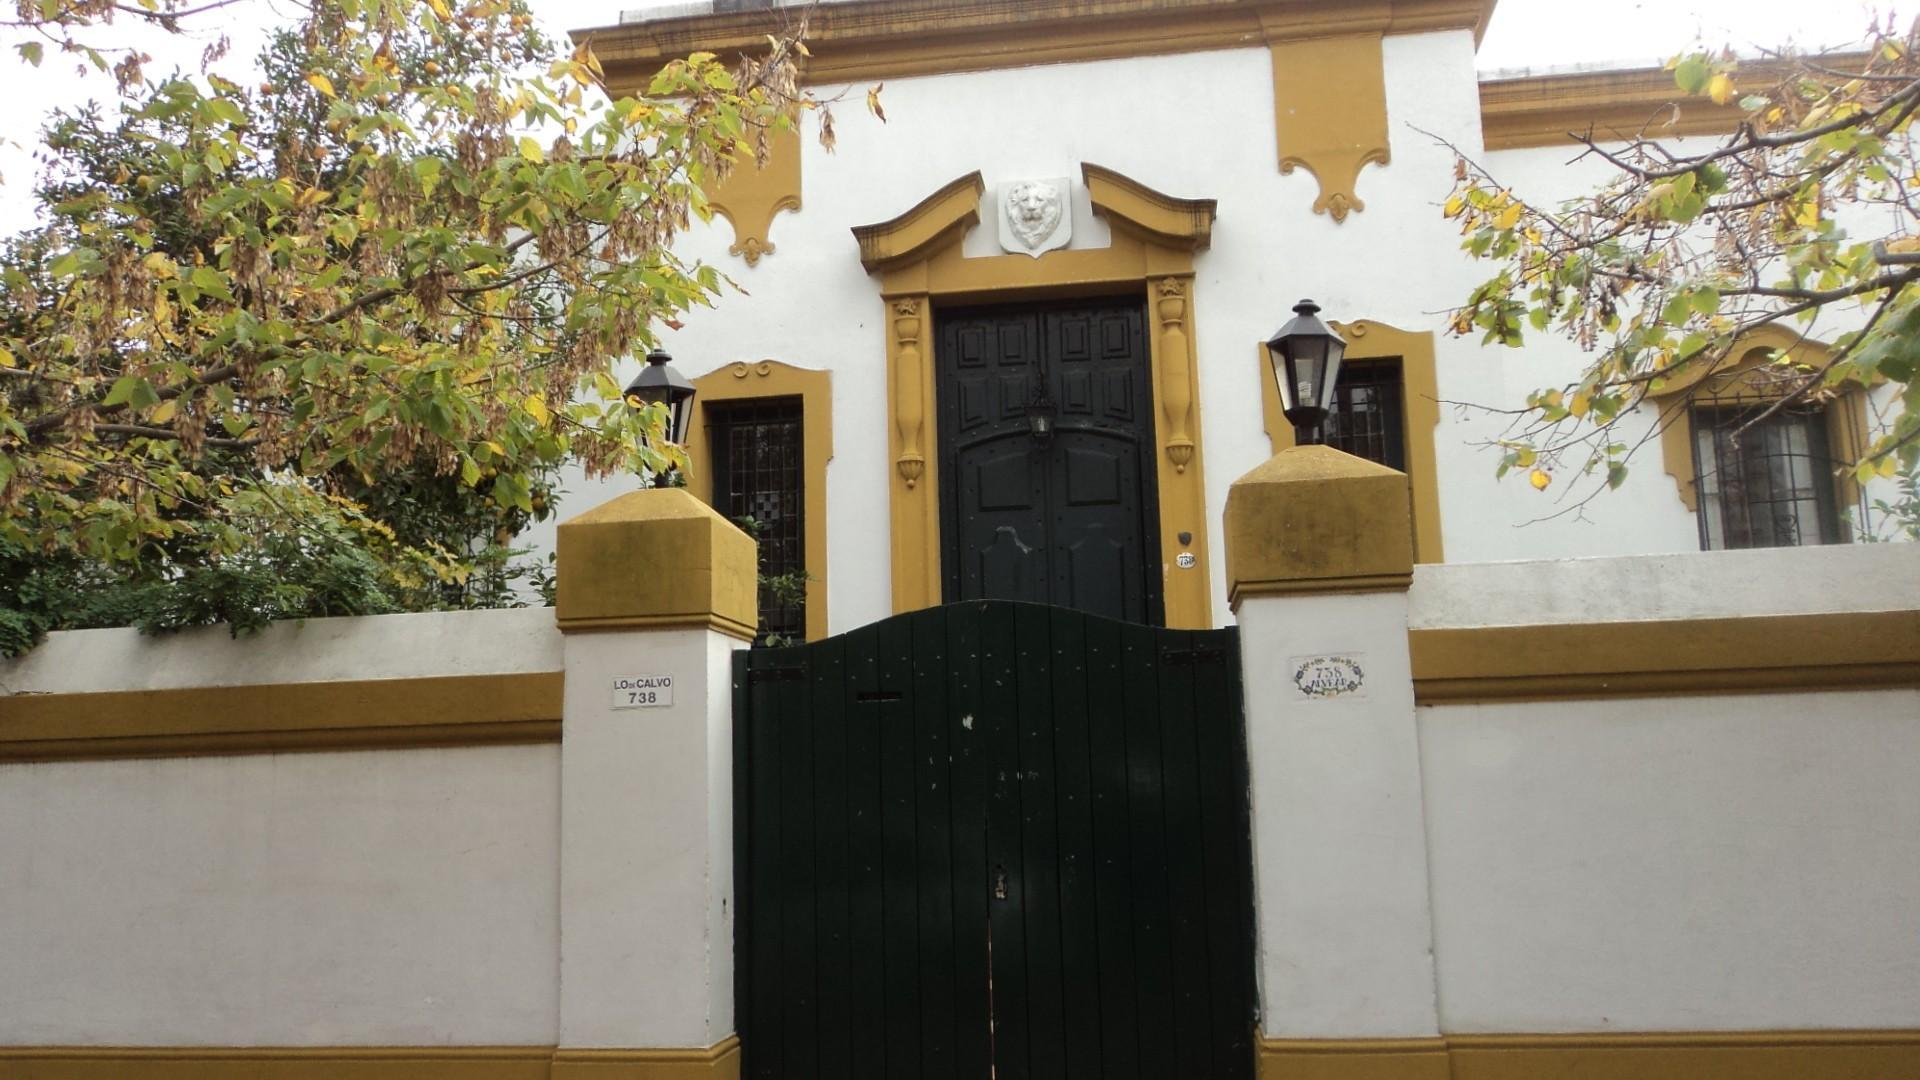 Lote en Avenida Alvear con 23.15 metros de frente sobre calle principal de Martínez